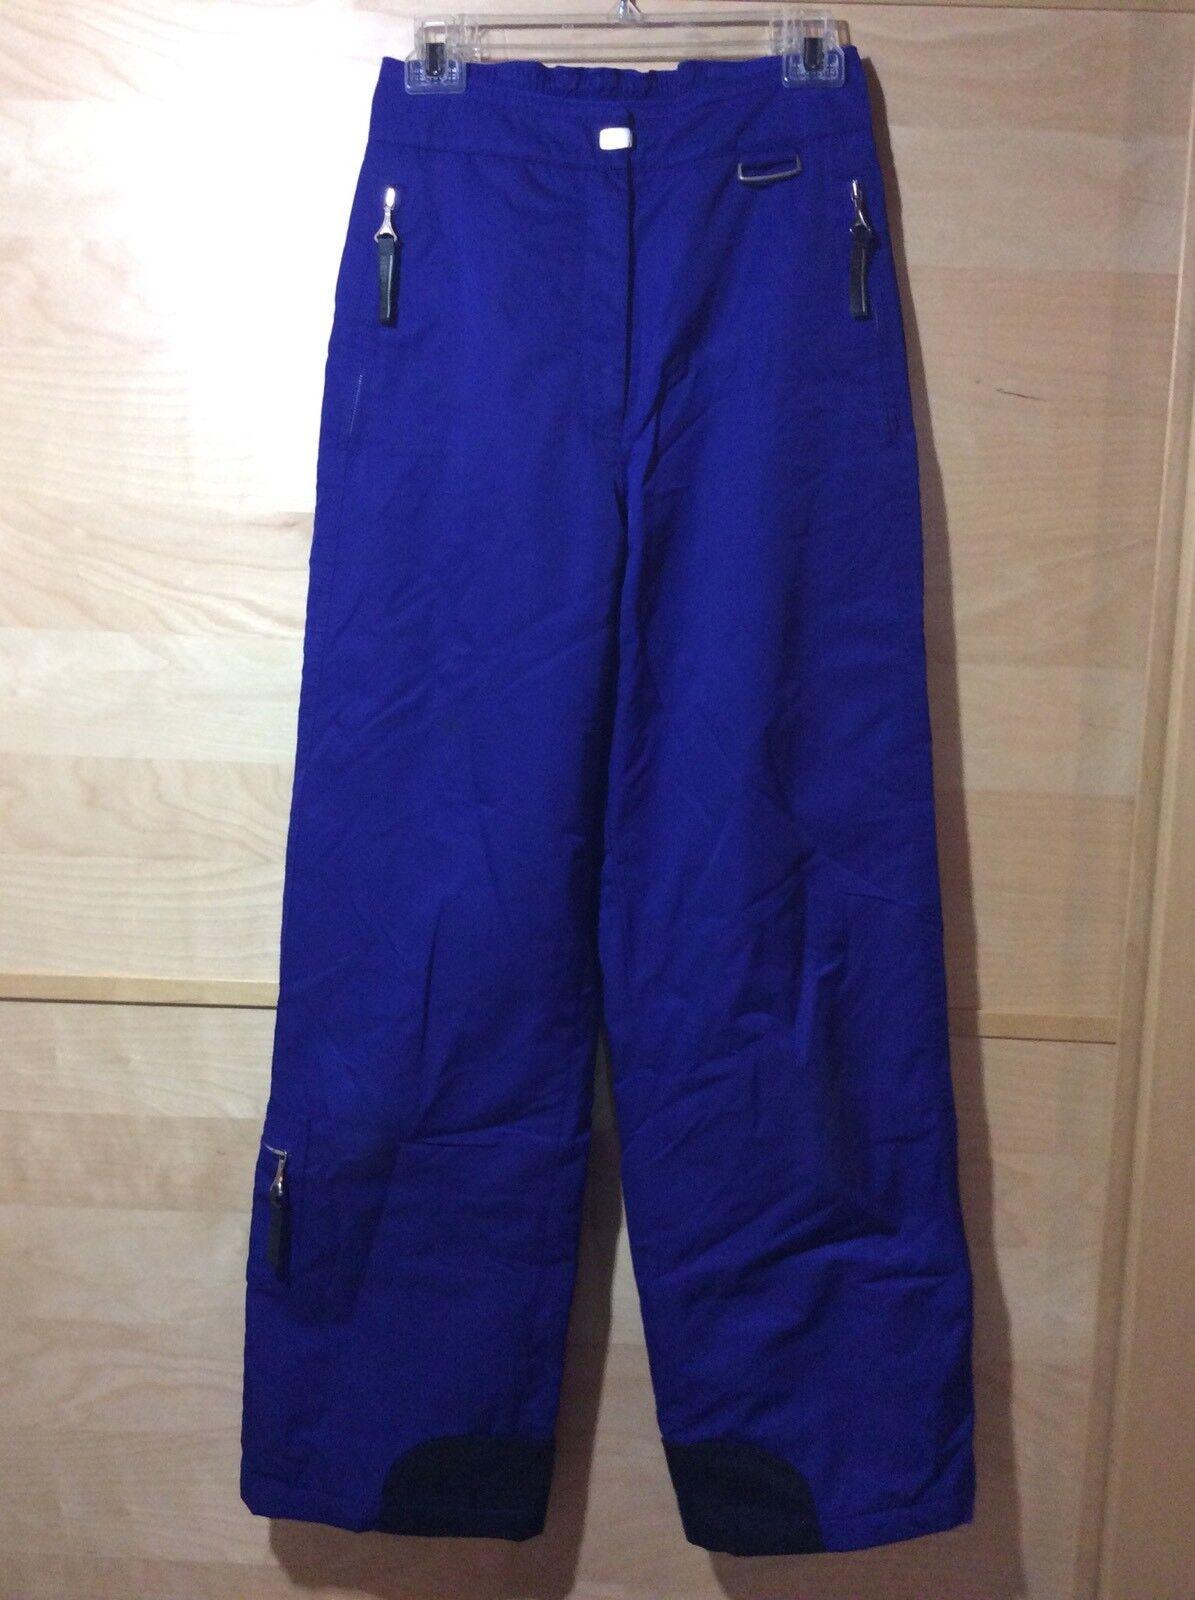 Couloir Metropolis Women bluee Ski Snow Pants 6, Pre-owned